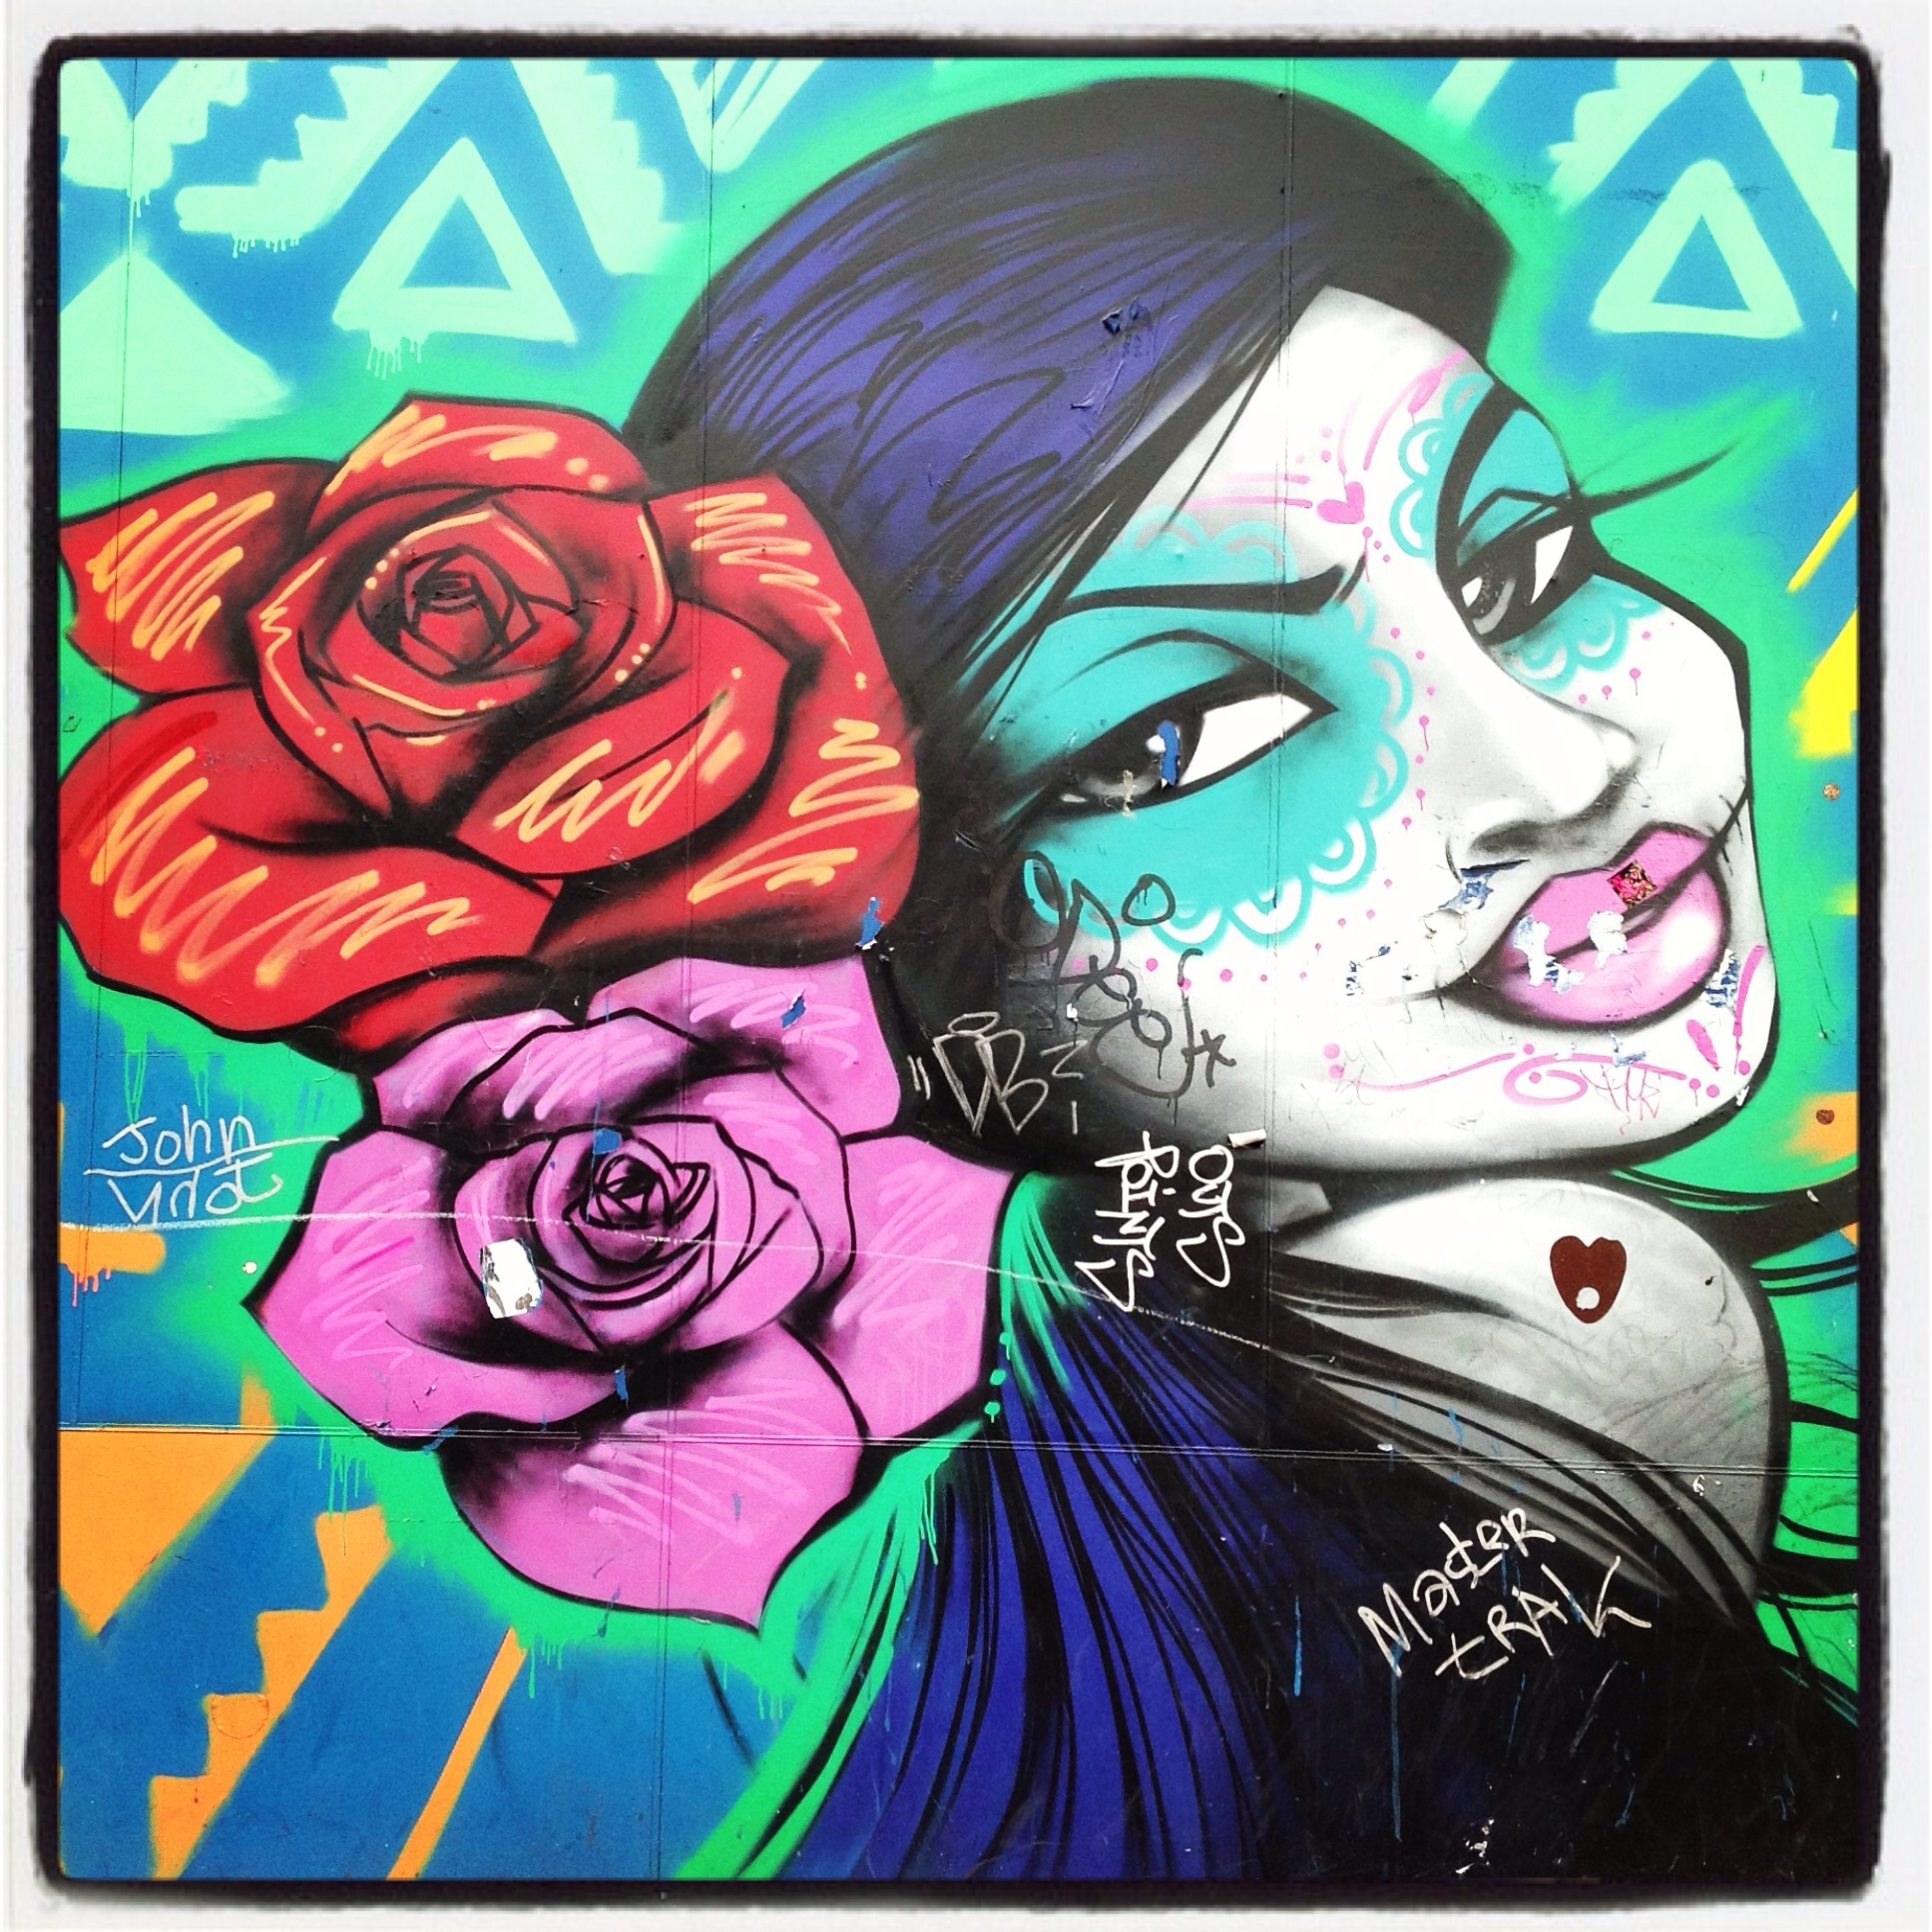 NYC GRAFFITI: FLOWER GIRL by LATINO LIFE – TOKIDOKI (NOMAD)